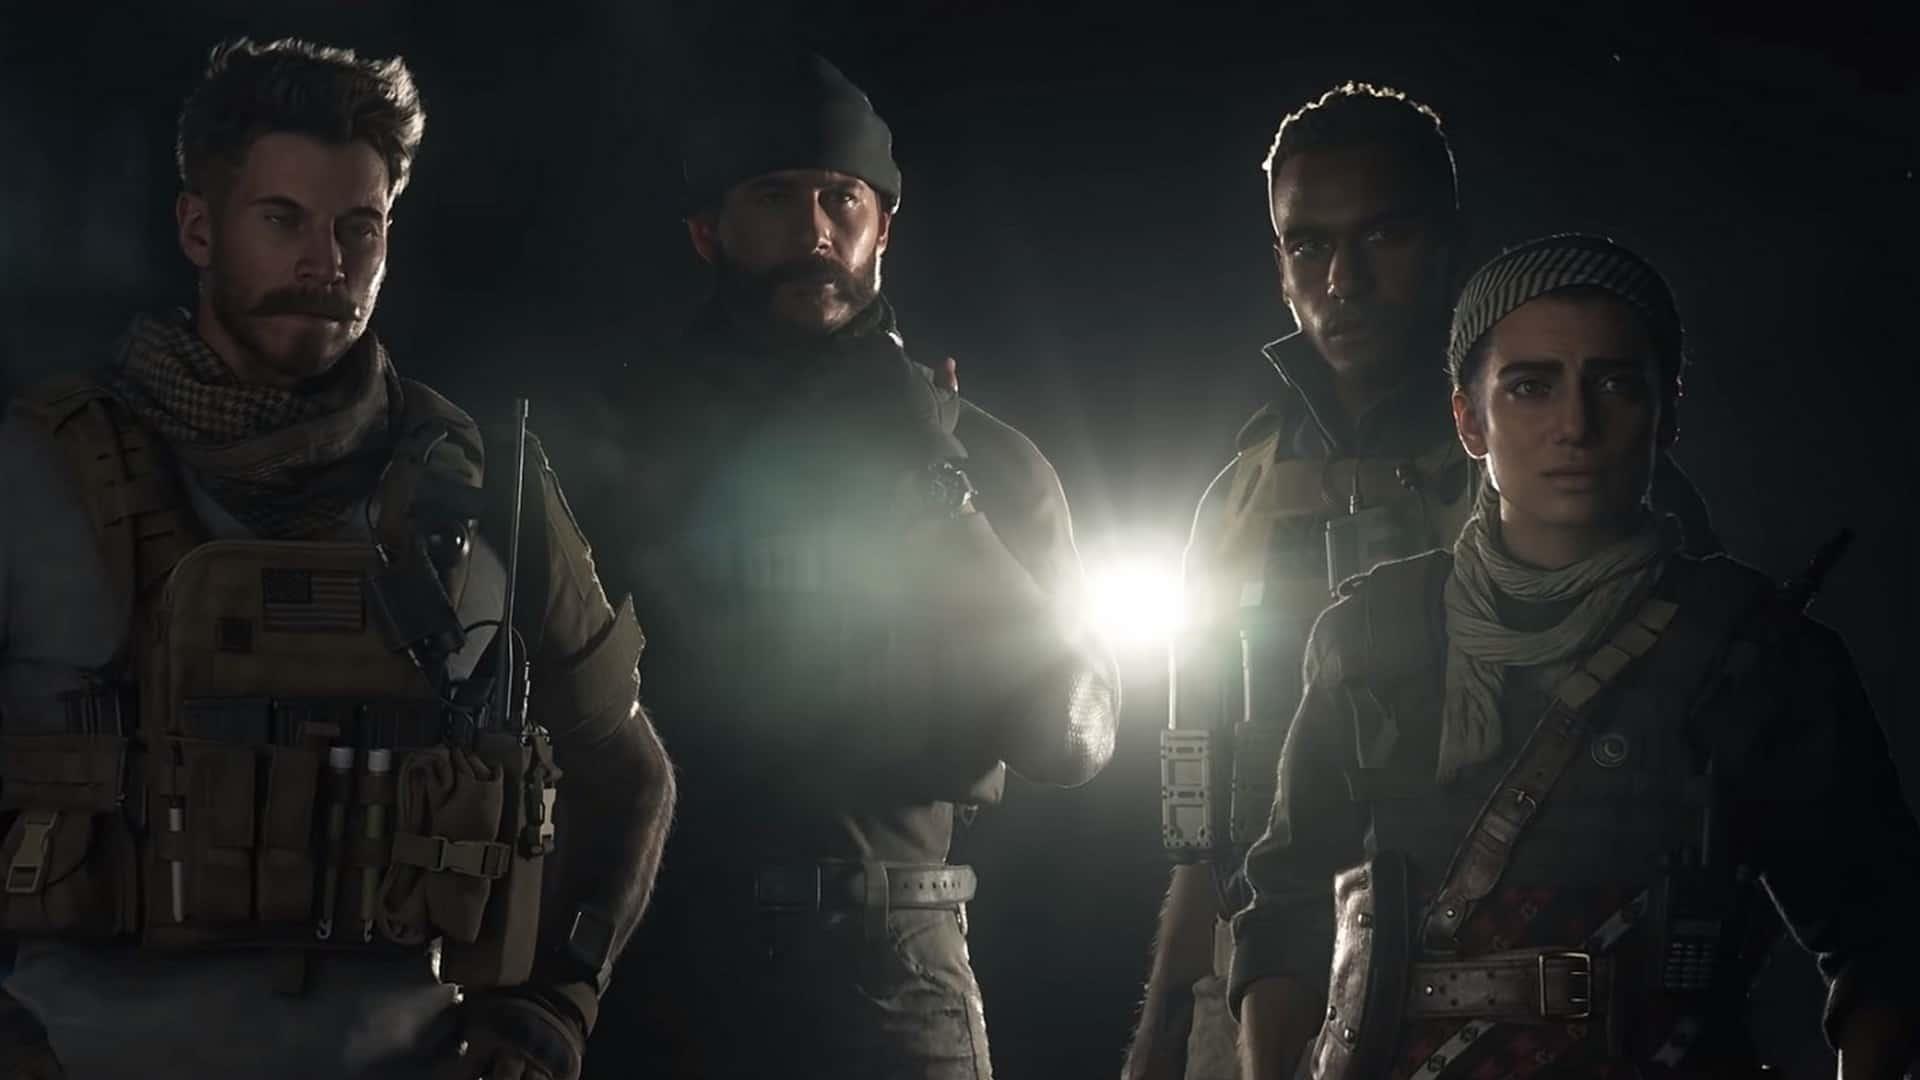 Call of Duty: Modern Warfare Story Trailer Revealed